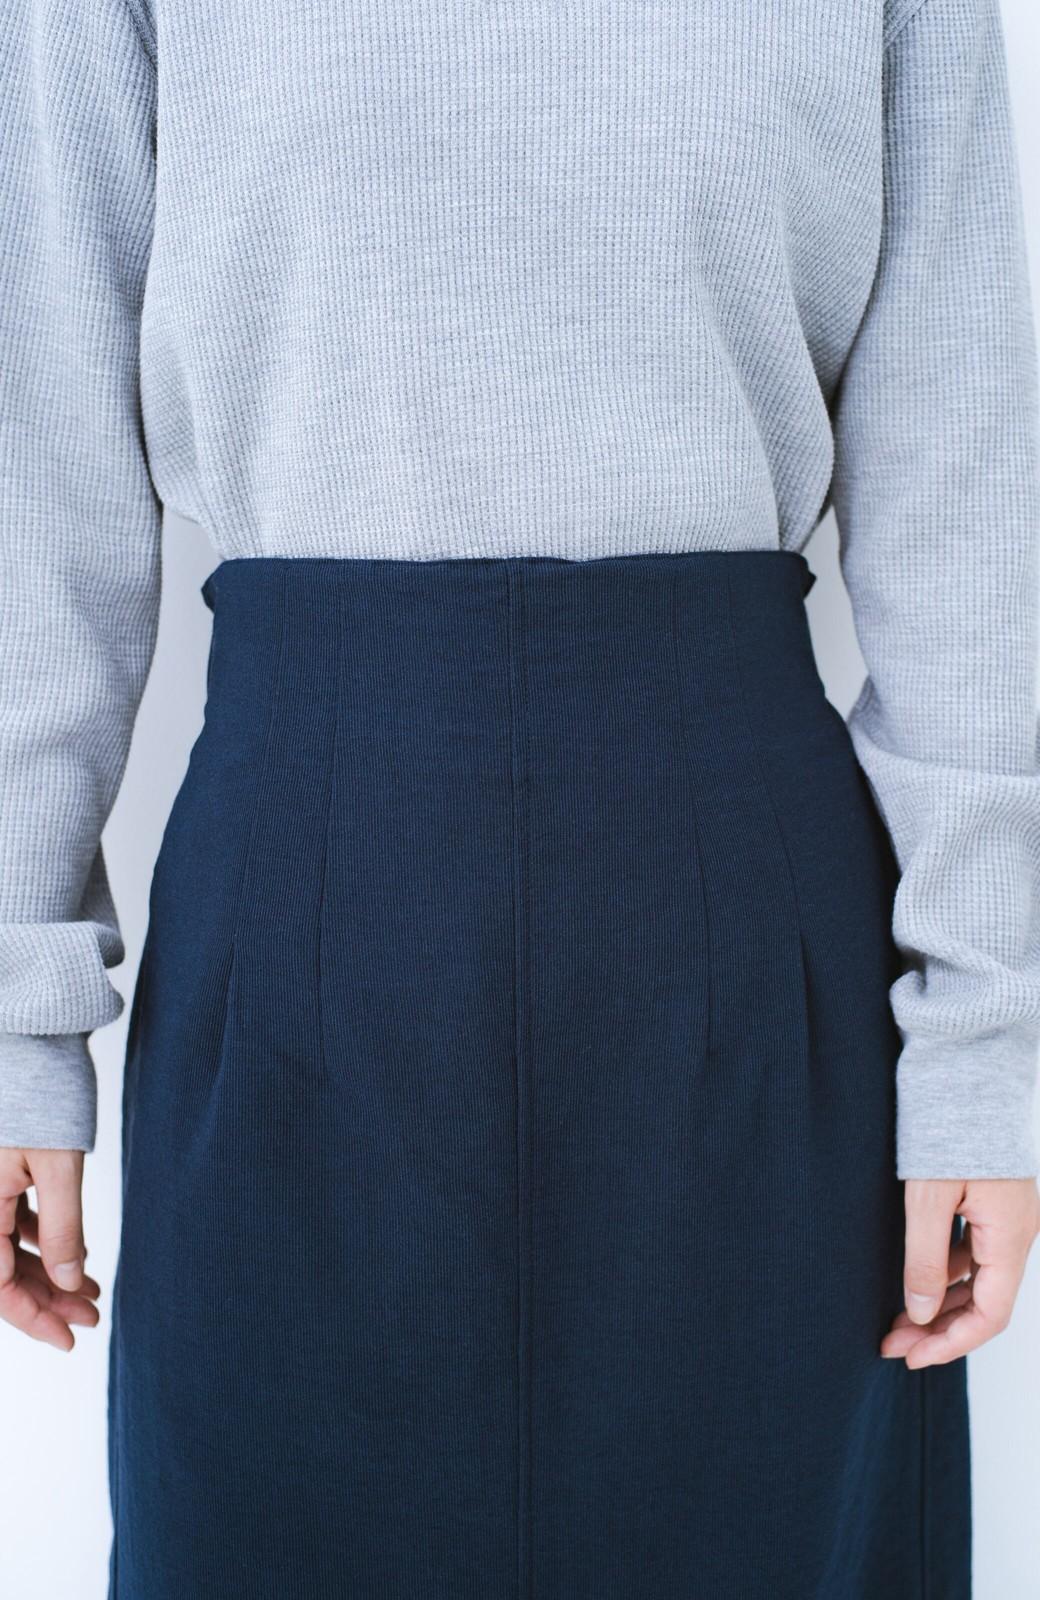 haco!  腹巻きとは呼ばせない ブルー期も華やかに過ごせる消臭加工裏地付きフリルデザインスカートセット【ブルー期】女の子バンザイ!プロジェクト <ネイビー>の商品写真16